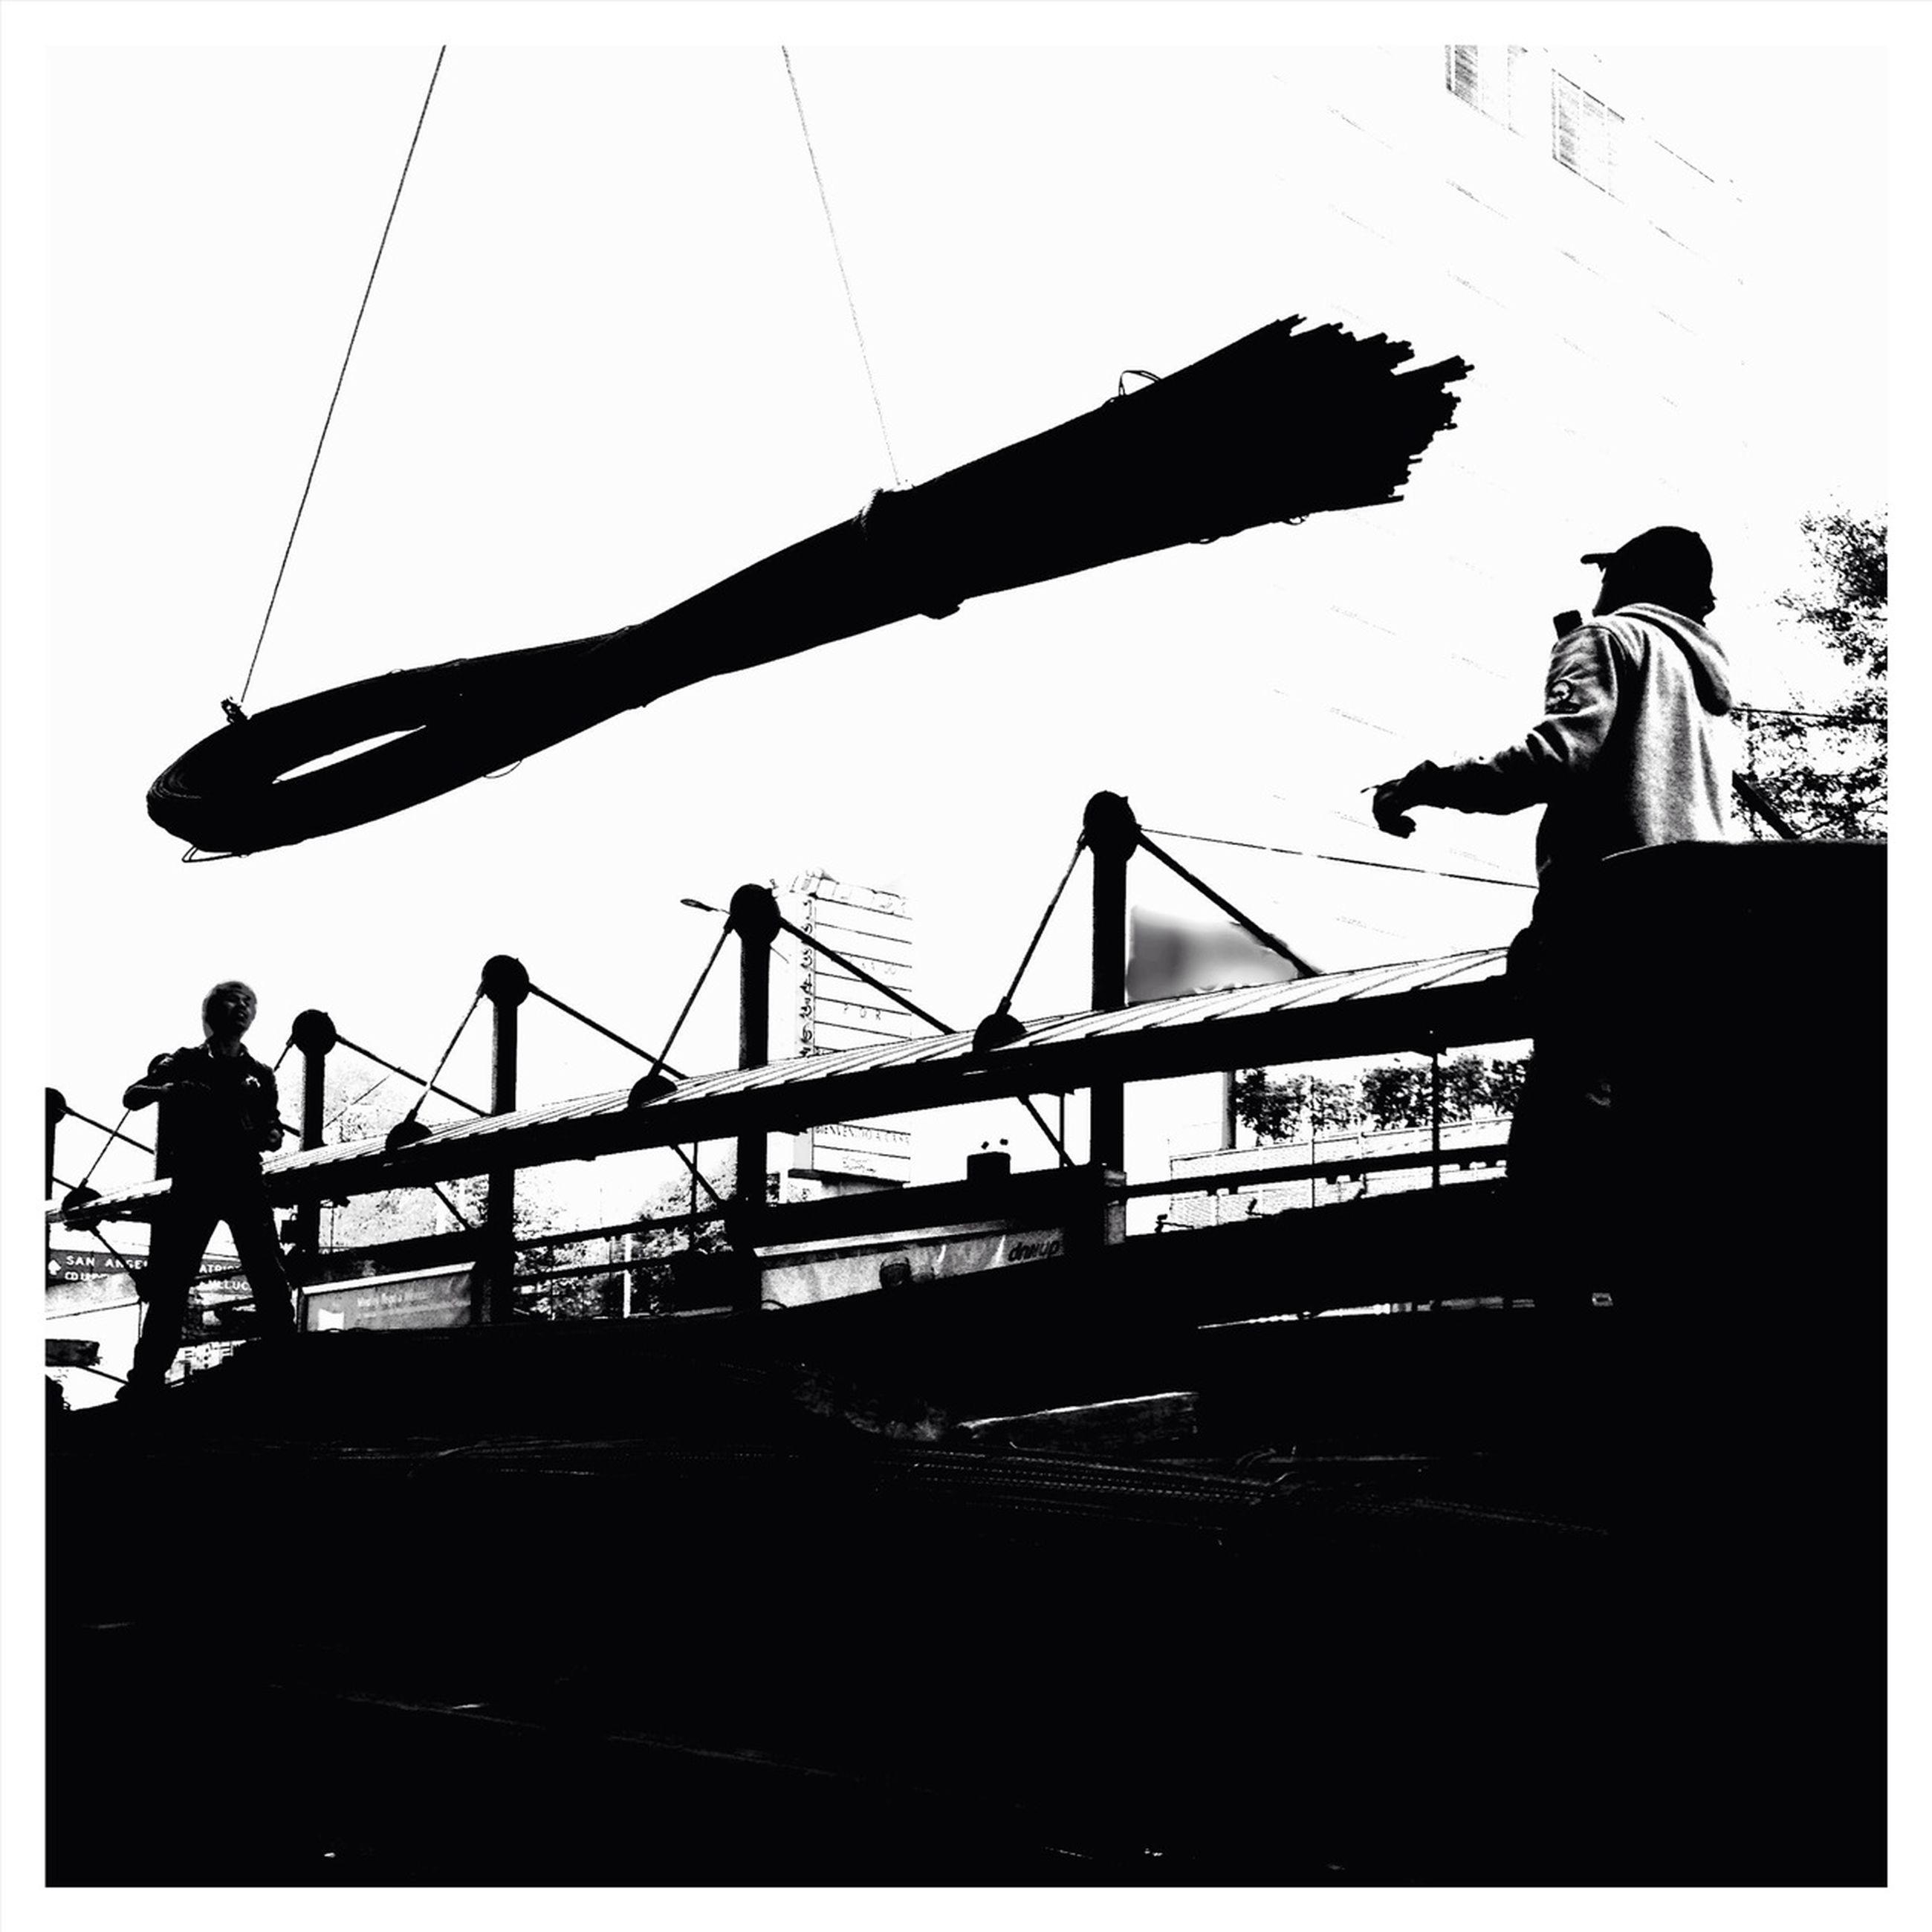 low angle view, built structure, silhouette, architecture, connection, construction site, sky, bridge - man made structure, crane - construction machinery, clear sky, outdoors, building exterior, sunset, transportation, railing, dusk, development, engineering, copy space, construction